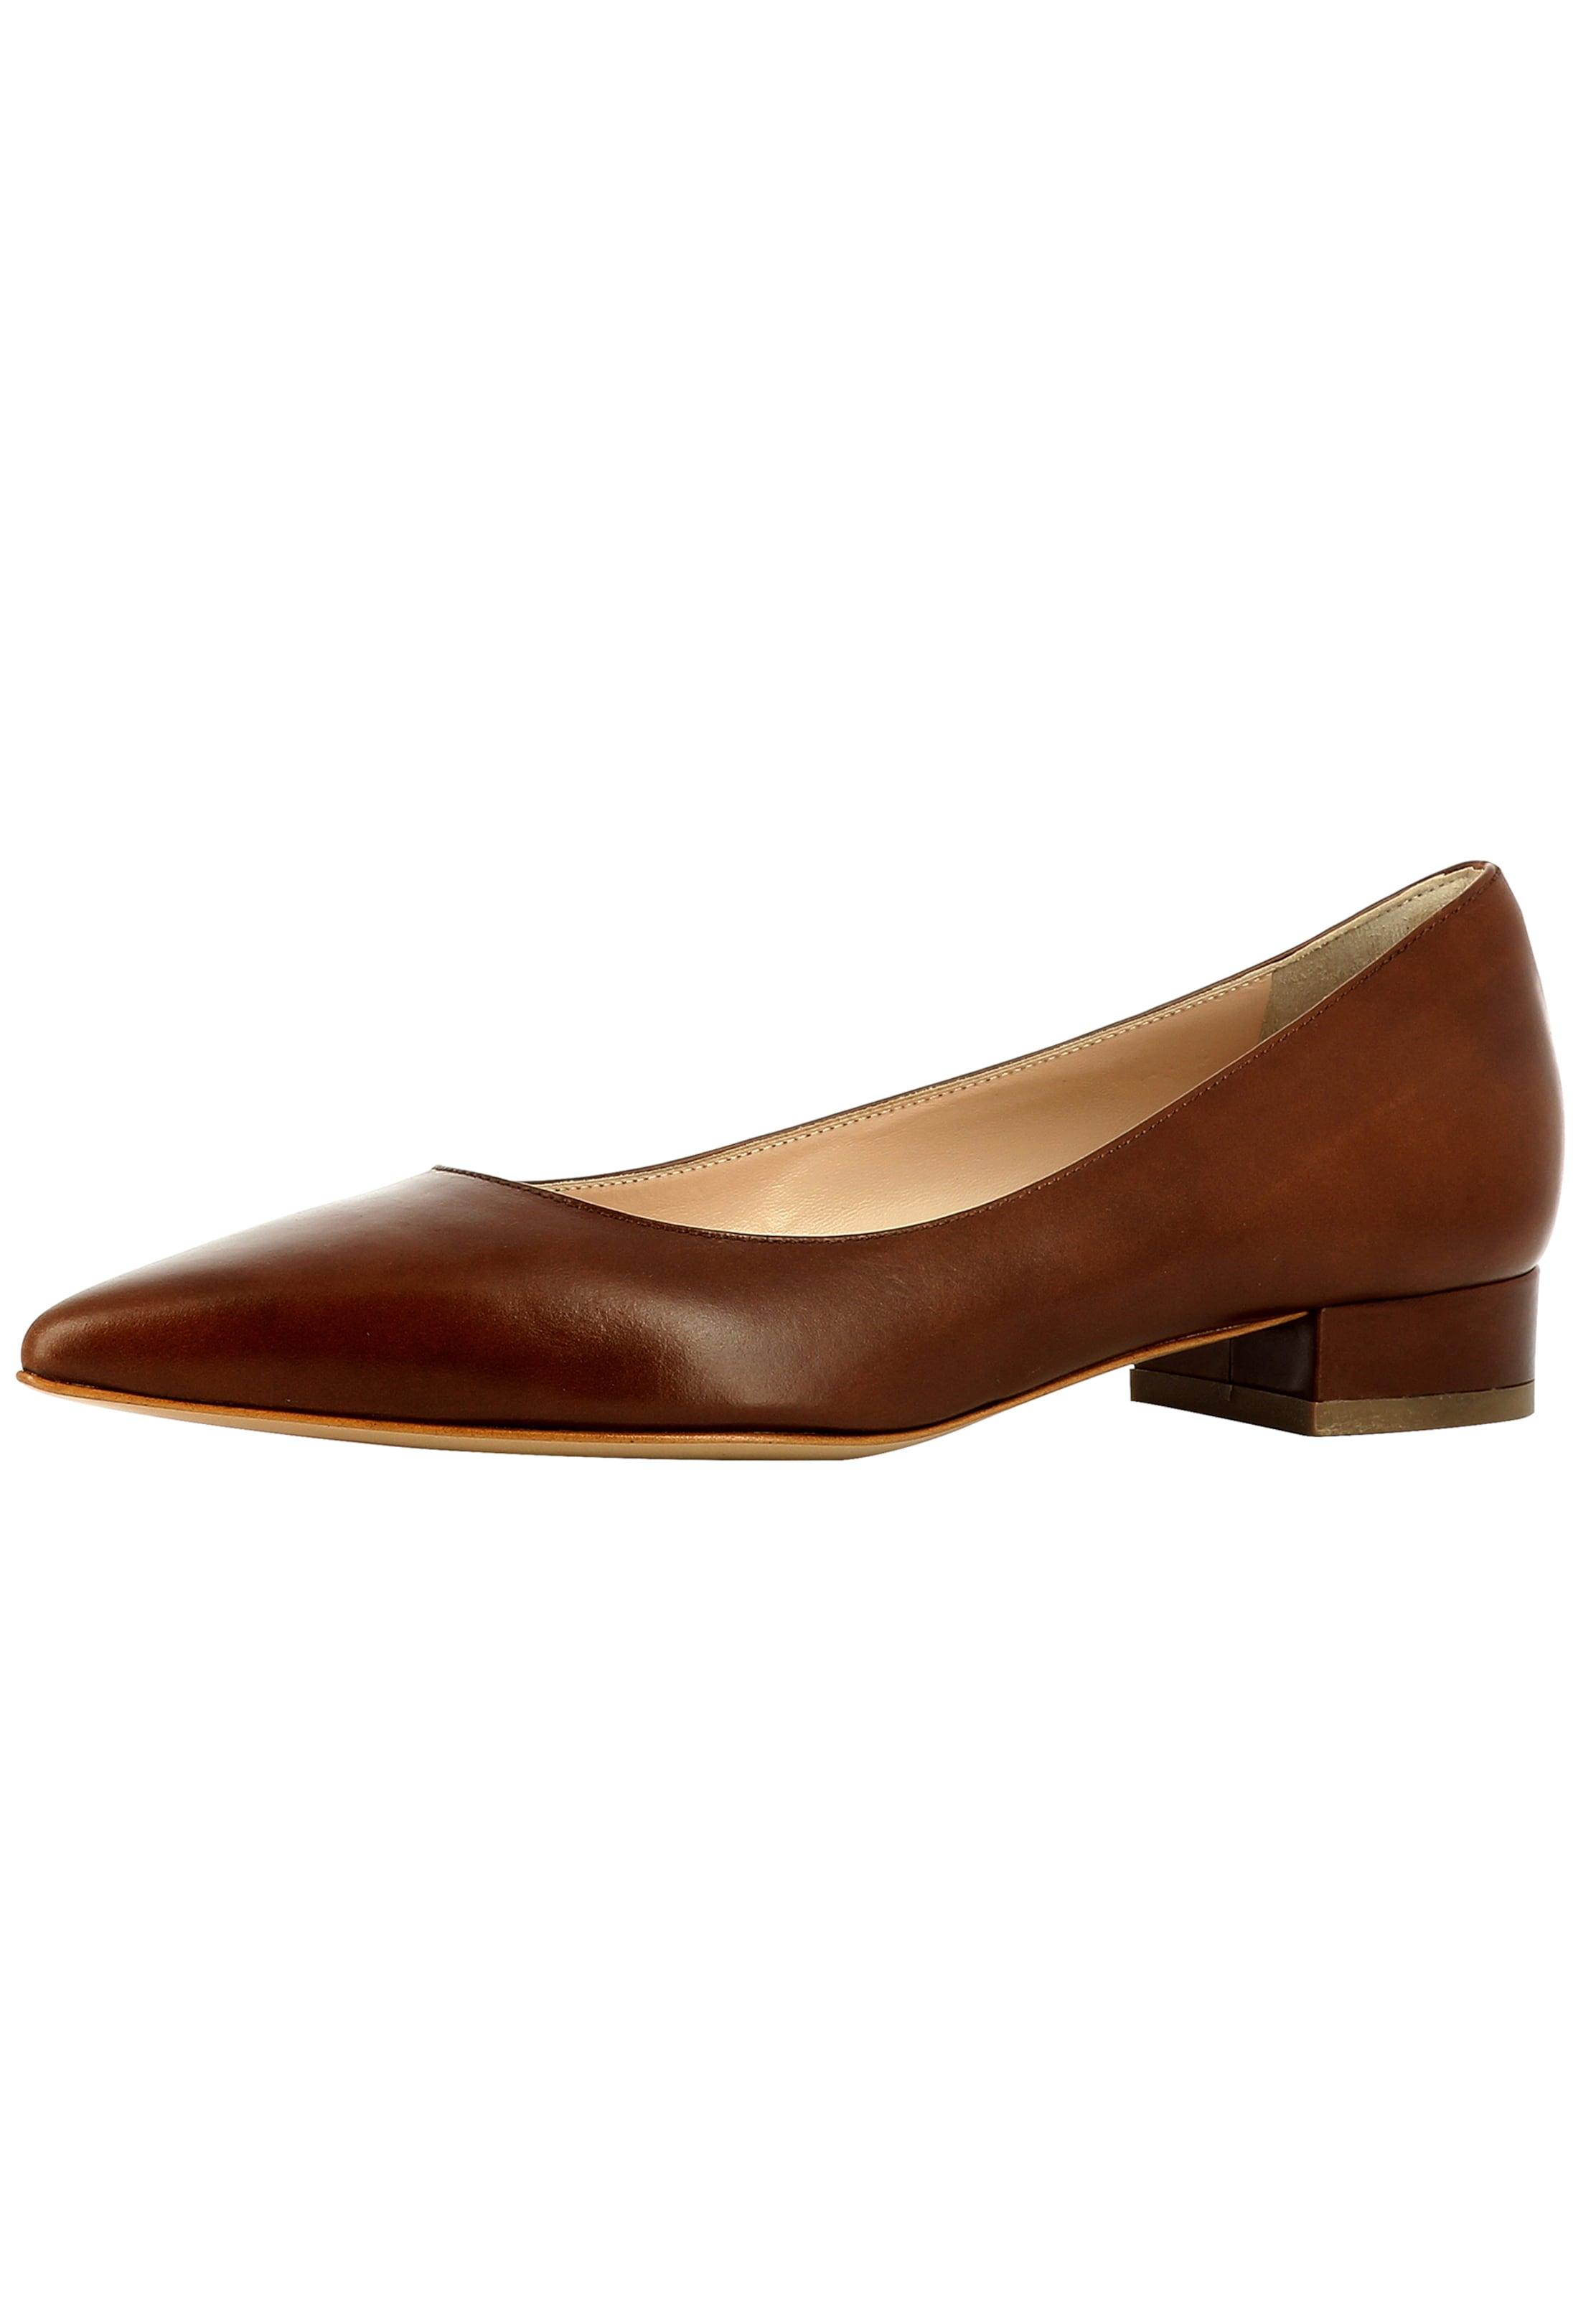 Haltbare Mode billige Schuhe Schuhe EVITA | Damen Pumps Schuhe Gut getragene Schuhe billige 9acb8e